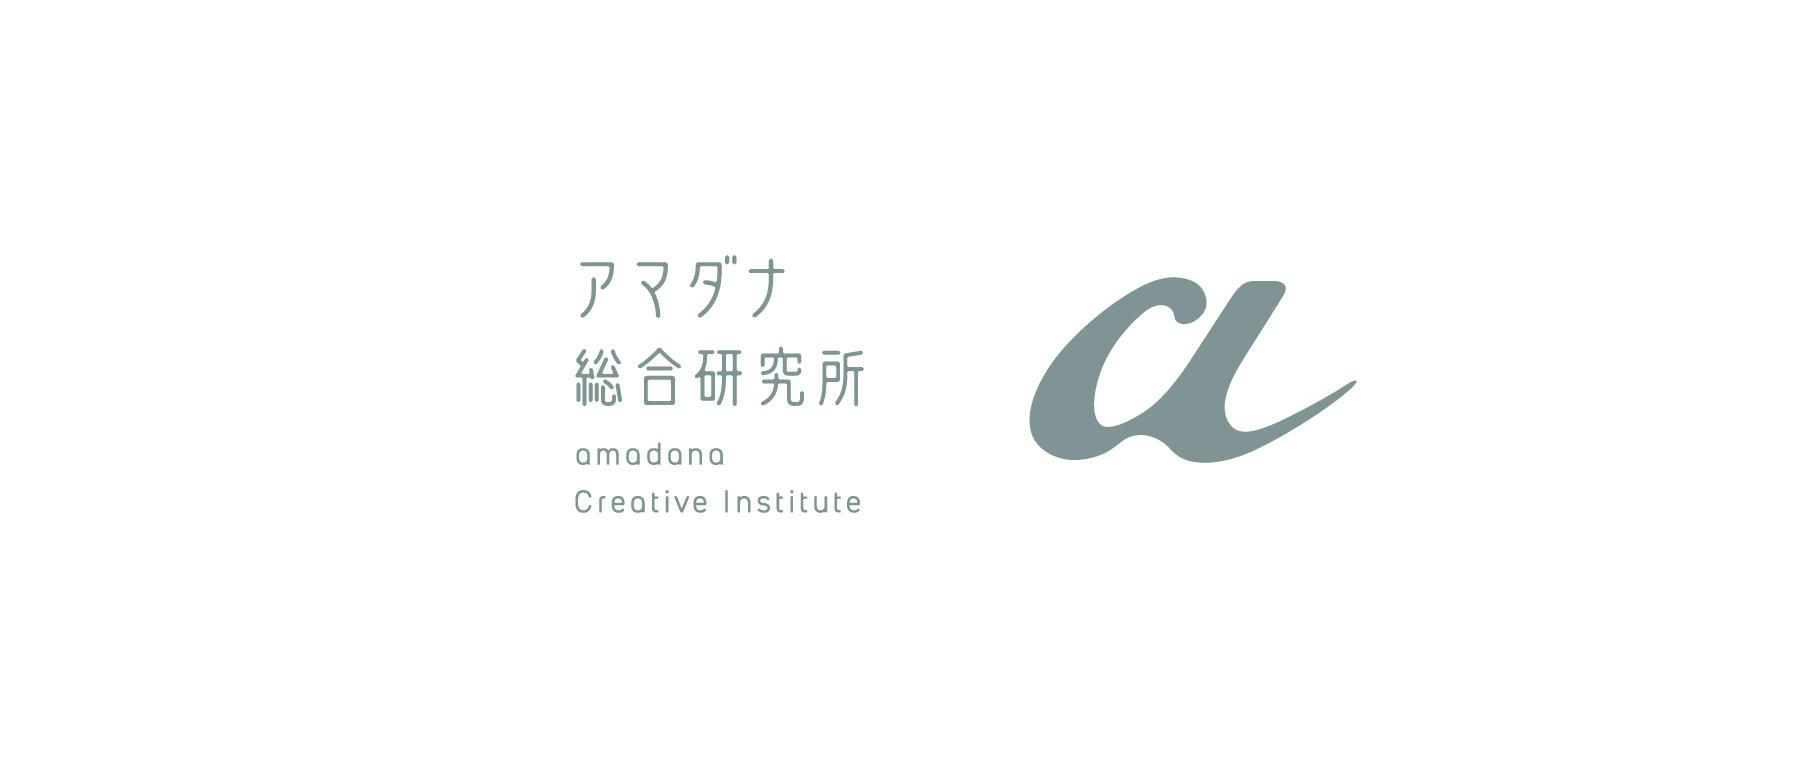 https://www.dle.jp/jp/service/assets_c/2020/10/3ad6269b96c90f11720f6d39d33fa9d571f11c70-thumb-1800x768-3750.jpg